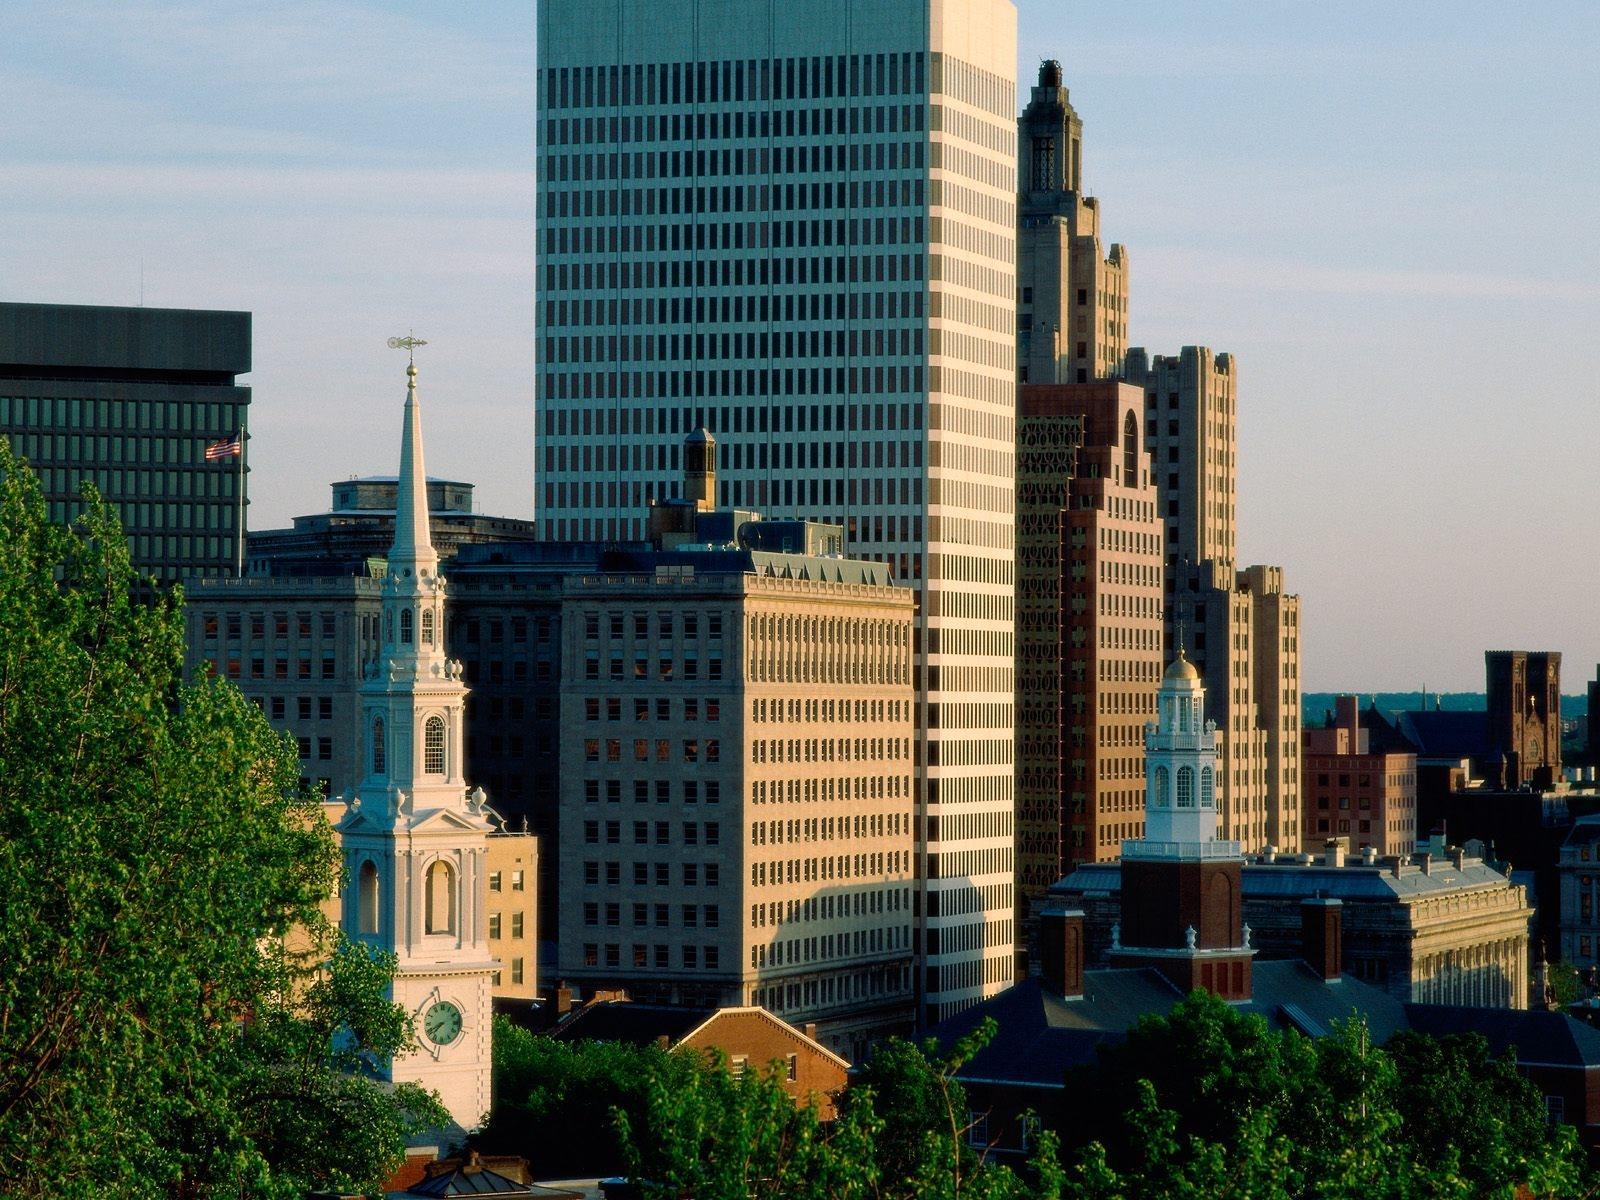 Photos USA Providence Rhode Island Cities Building 1600x1200